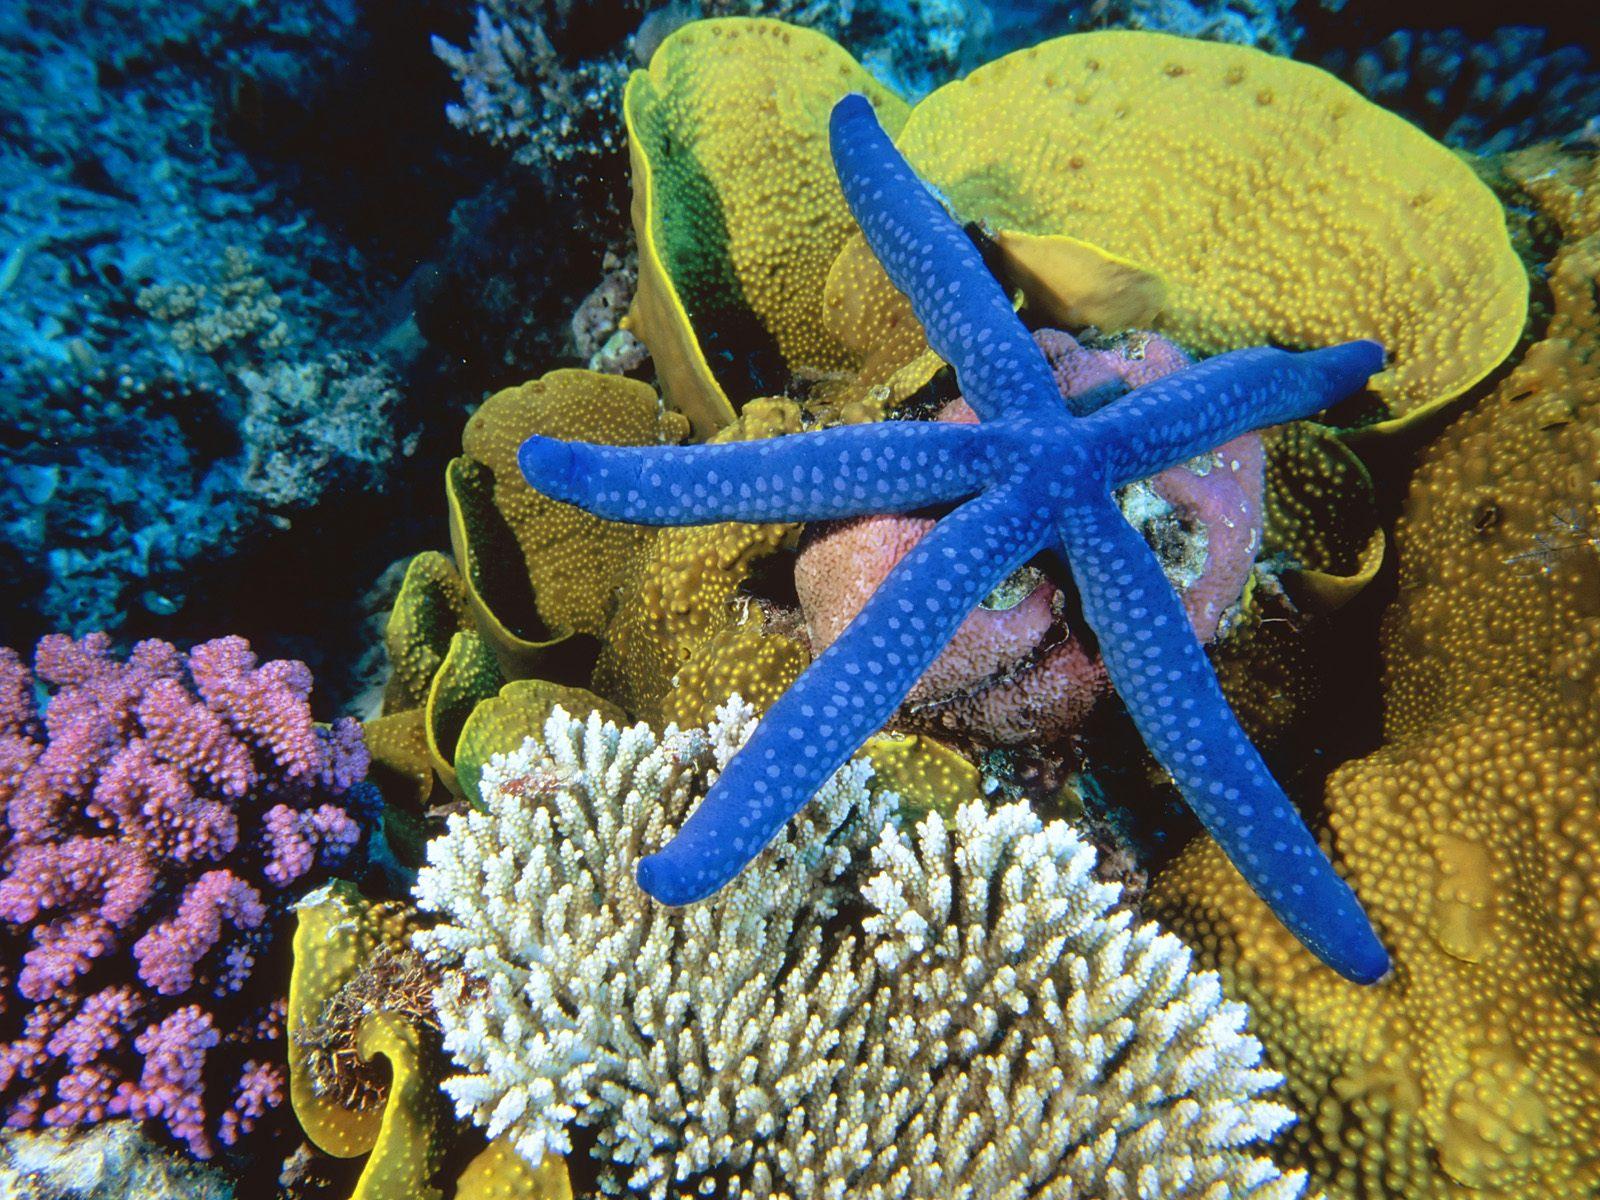 Hd Wallpapers Hd Great Barrier Reef Wallpapers